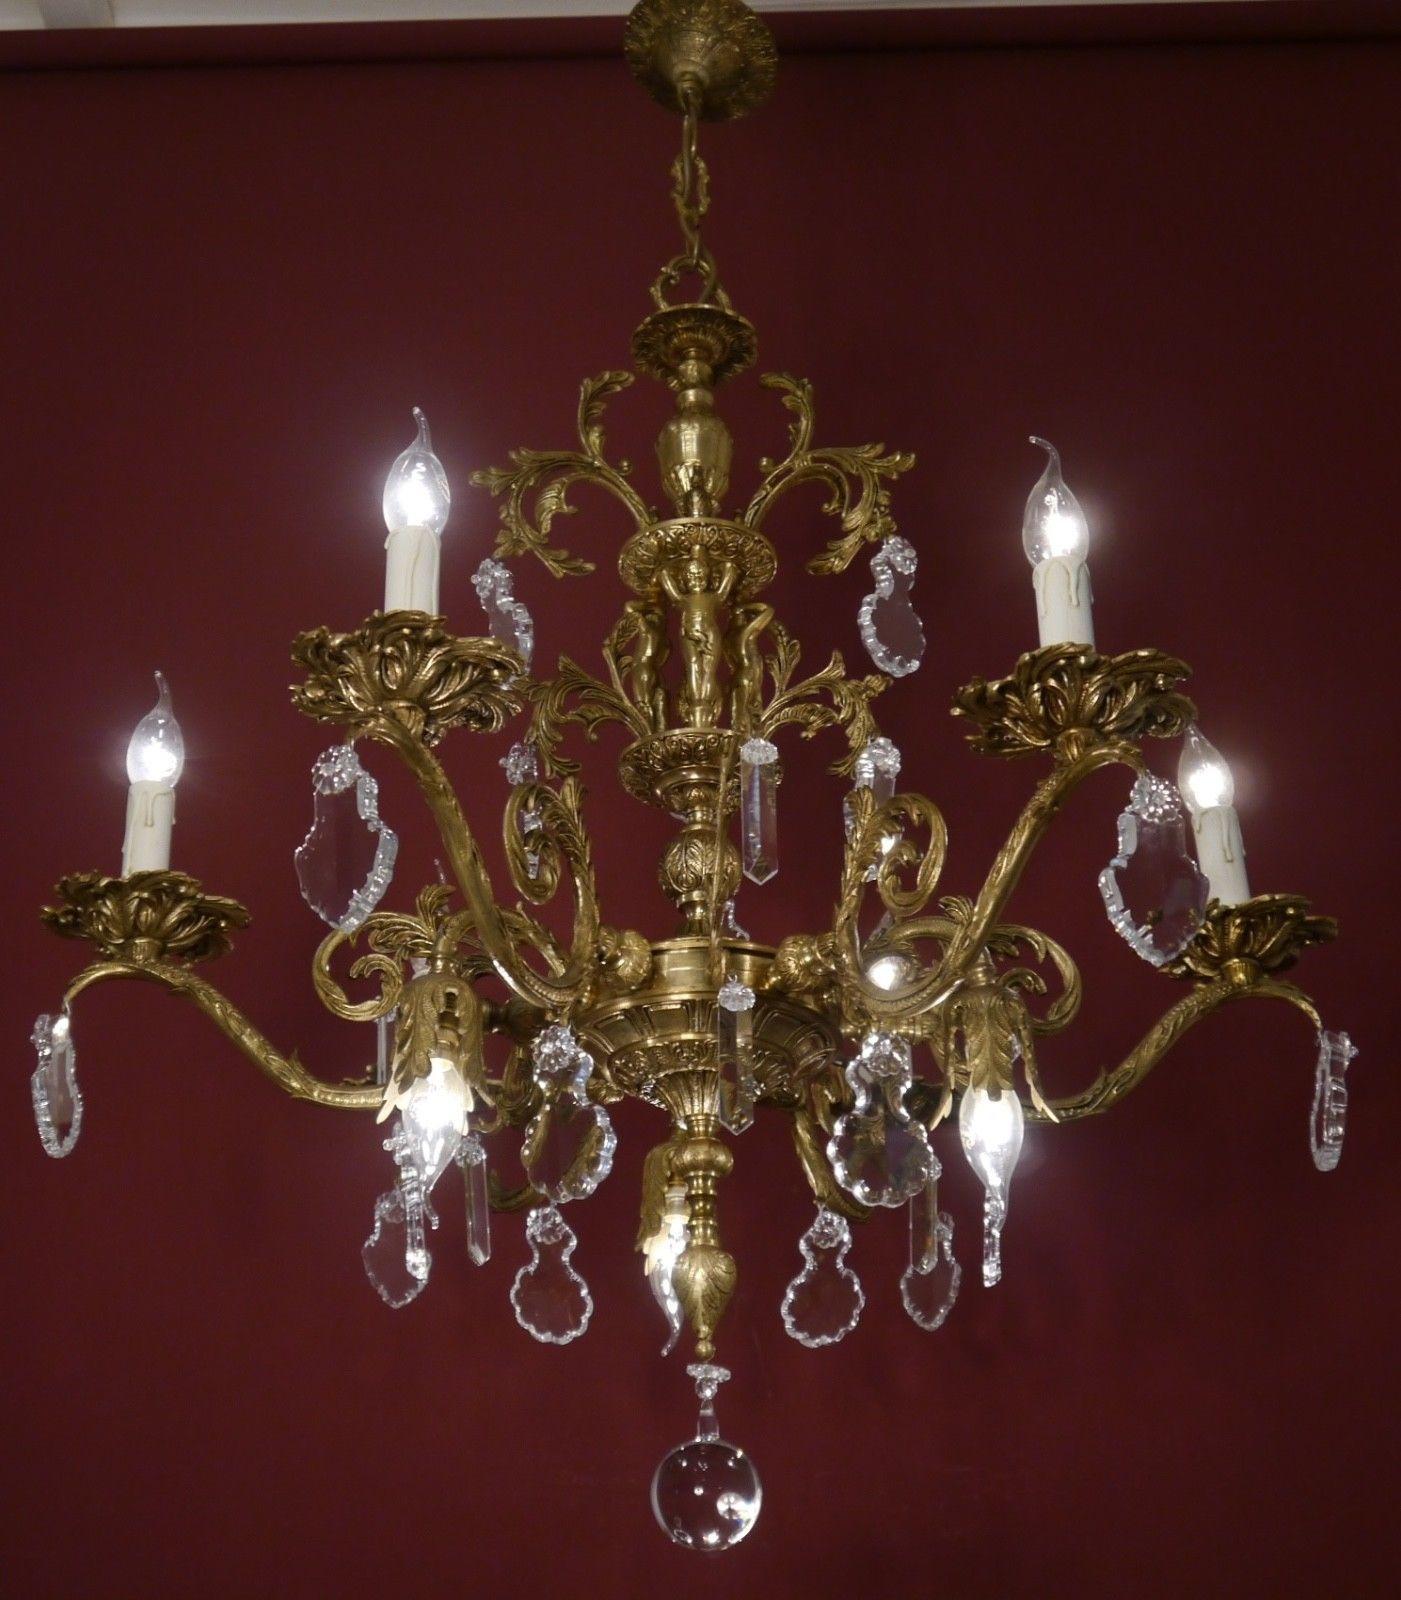 RARE BIG 9 LIGHTS CHERUBS BRASS SPANISH CRYSTAL CHANDELIER BAROQUE